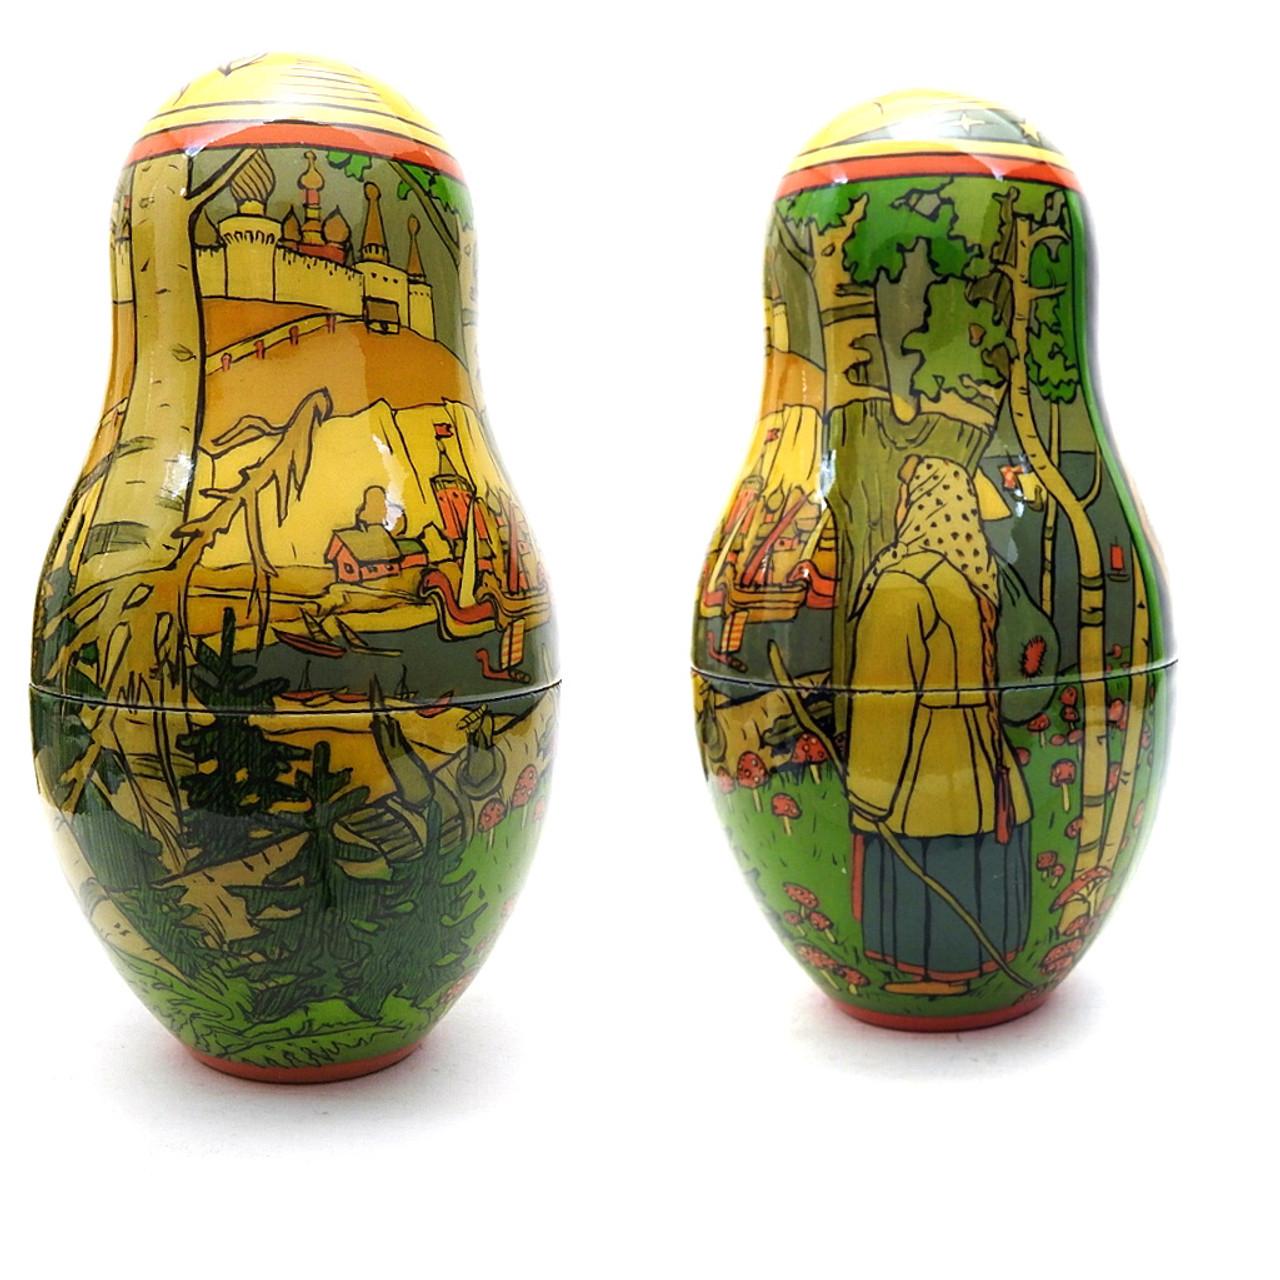 Bilibin Fairy Tales Illustrations Artistic Matryoshka 6th Doll Two Views